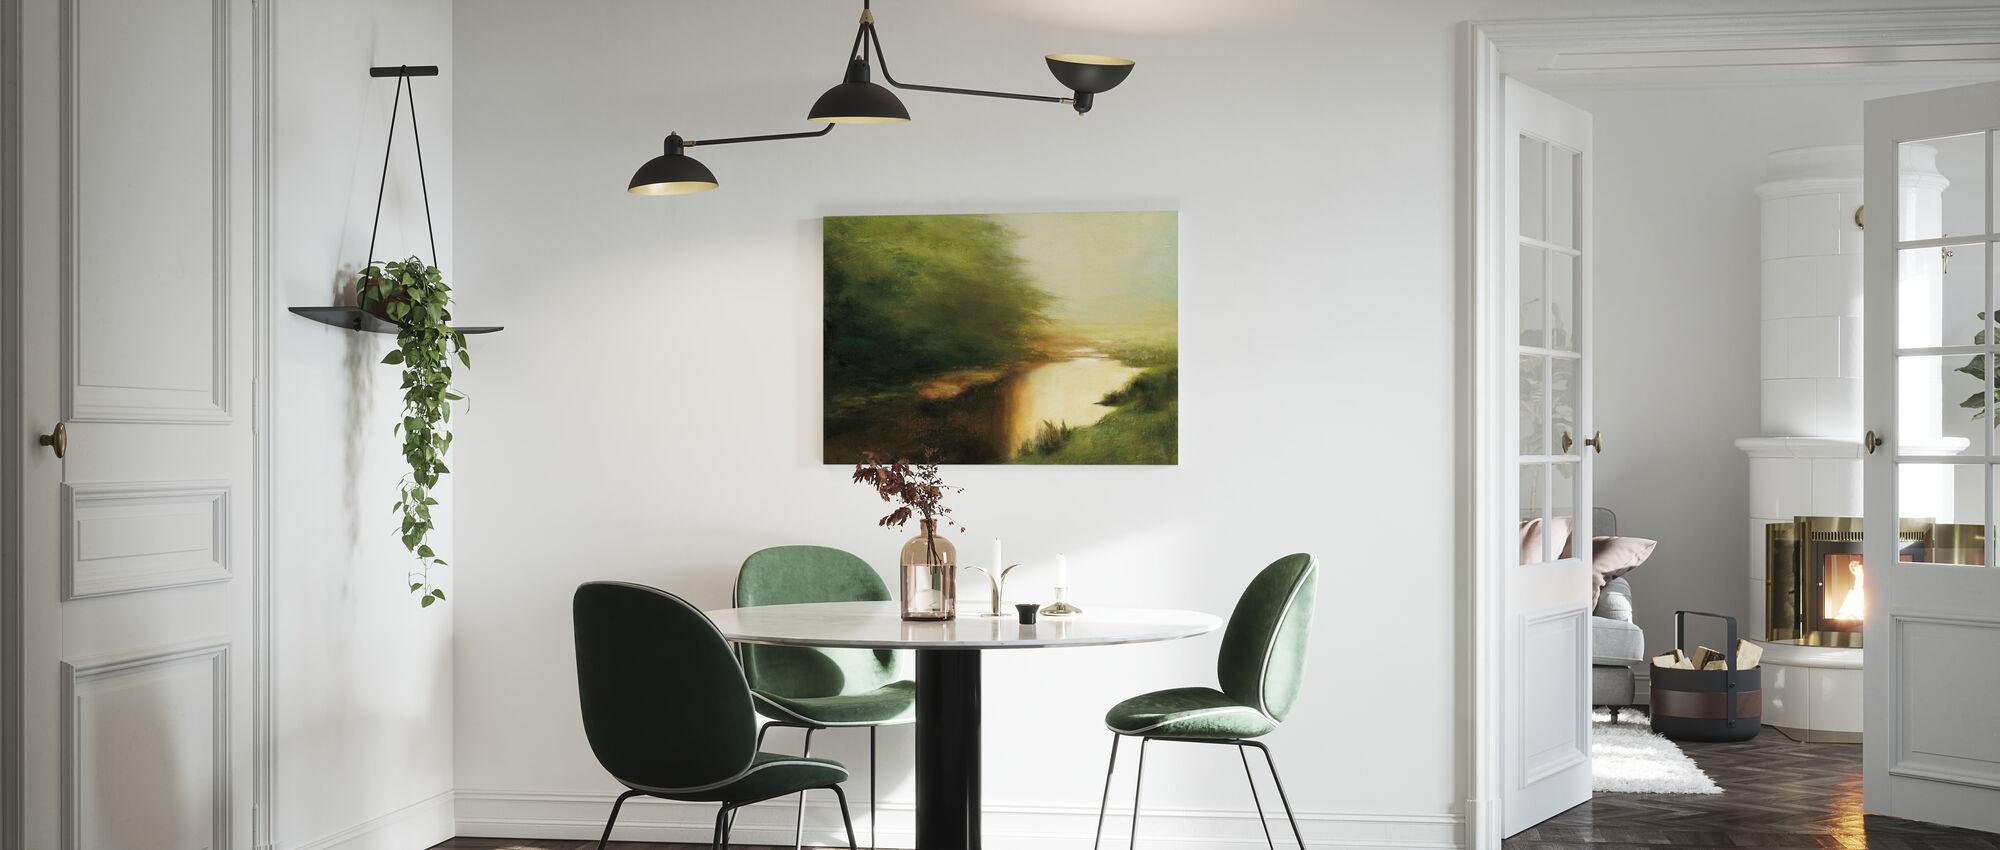 Spring Morning - Canvas print - Kitchen